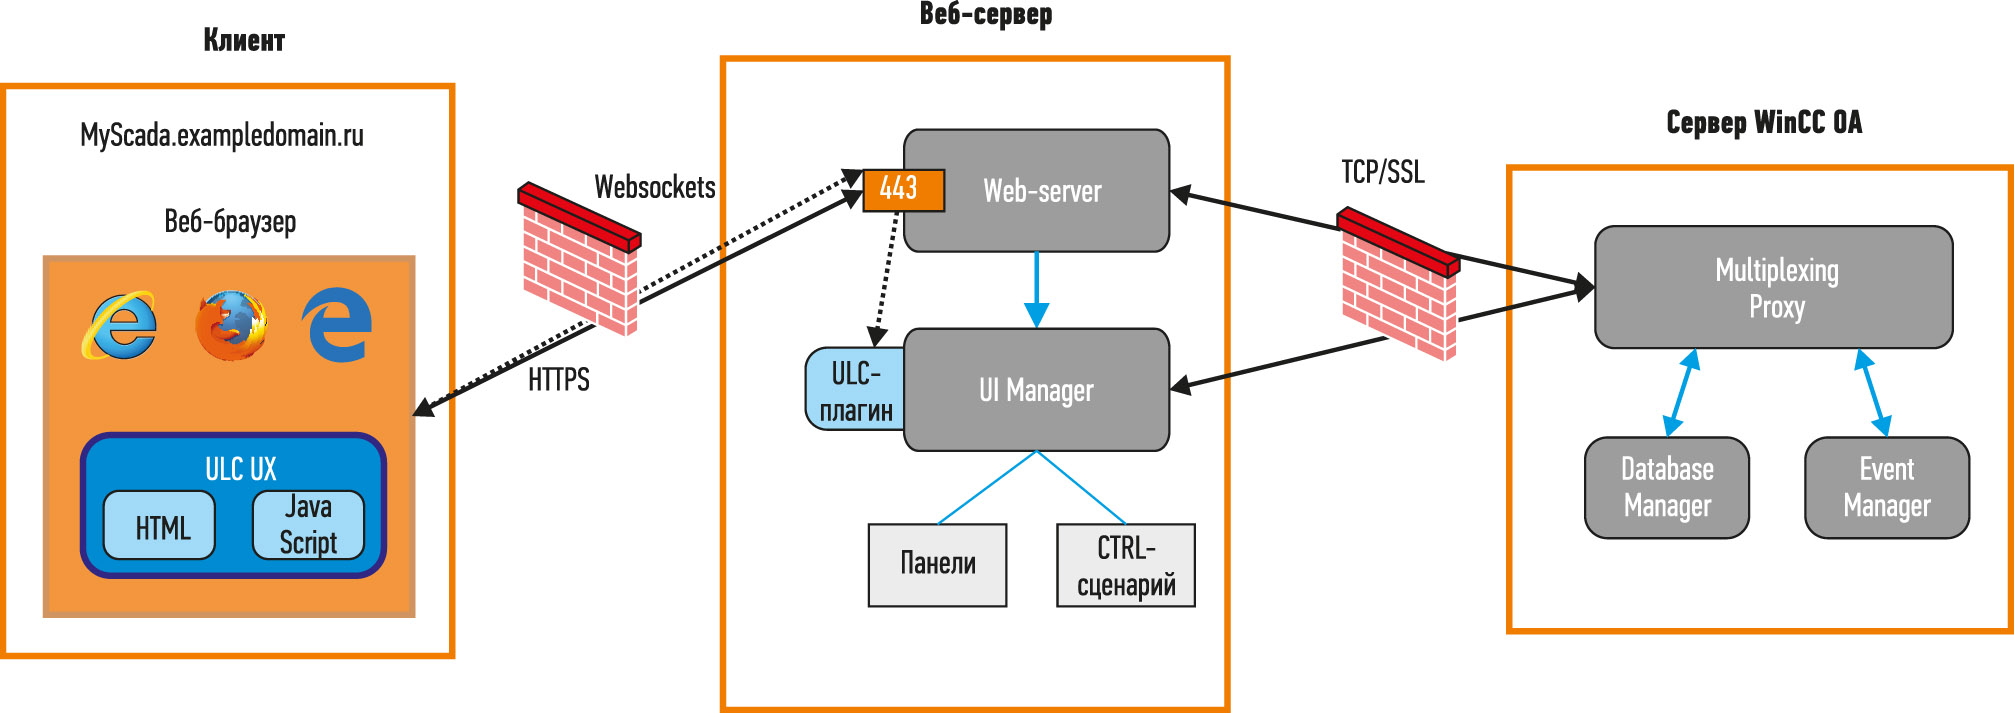 Рис. 3. Принцип работы ультралегкого веб-клиента ULC UX